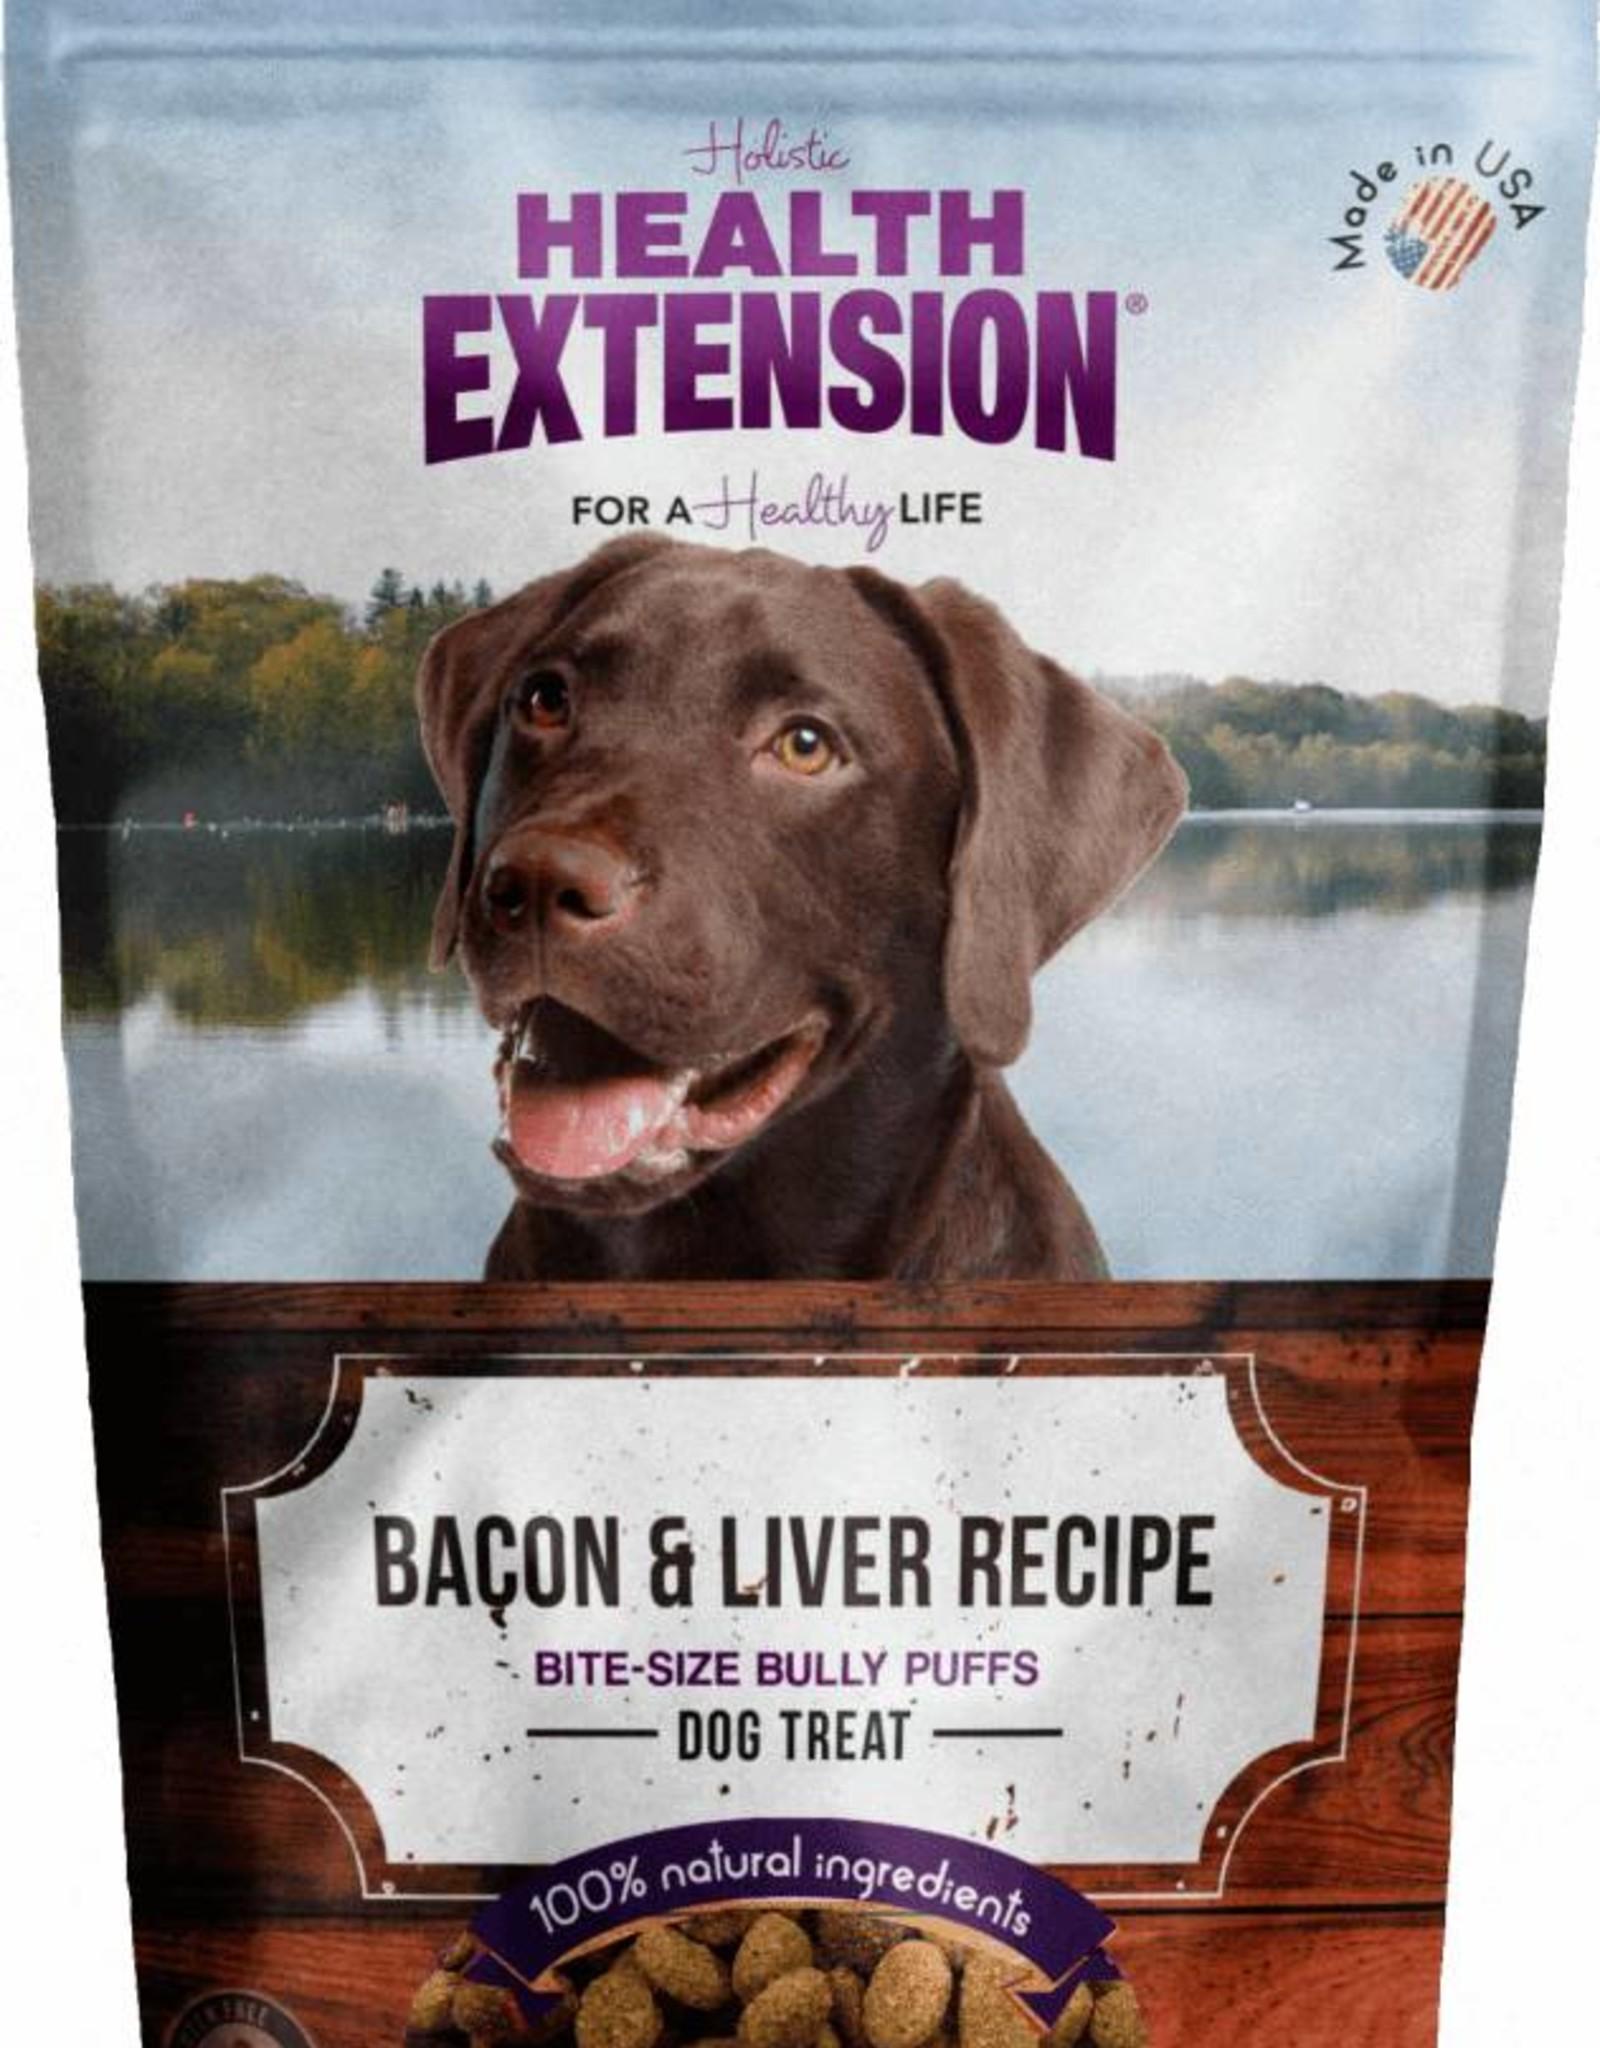 Health Extension Bully Puffs Bacon & Liver Grain-Free Dog Treats, 5 oz